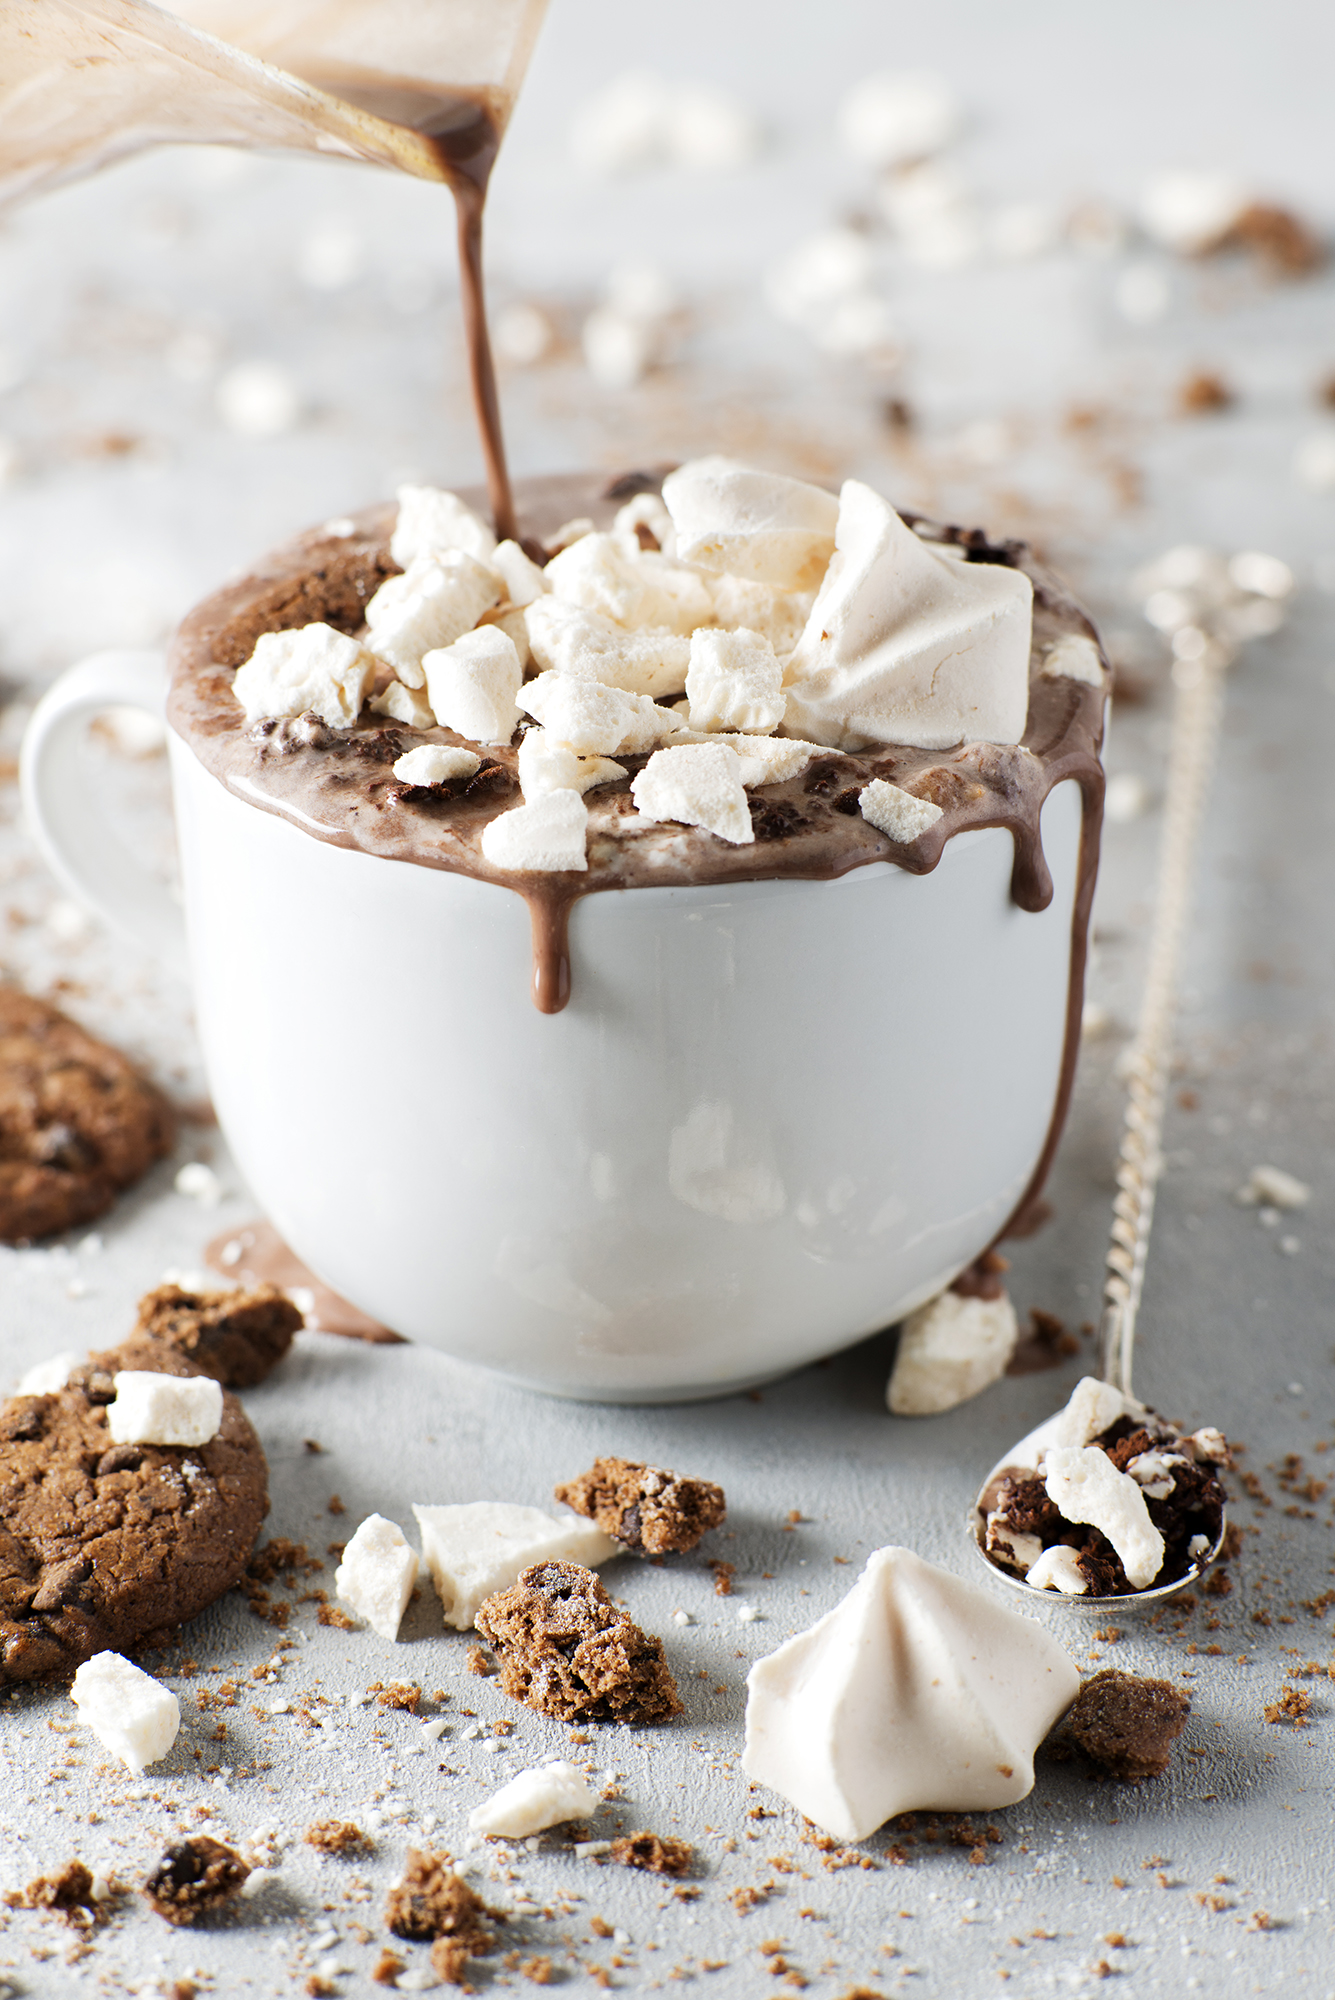 maud argaibi, photo culinaire, chocolat chaud